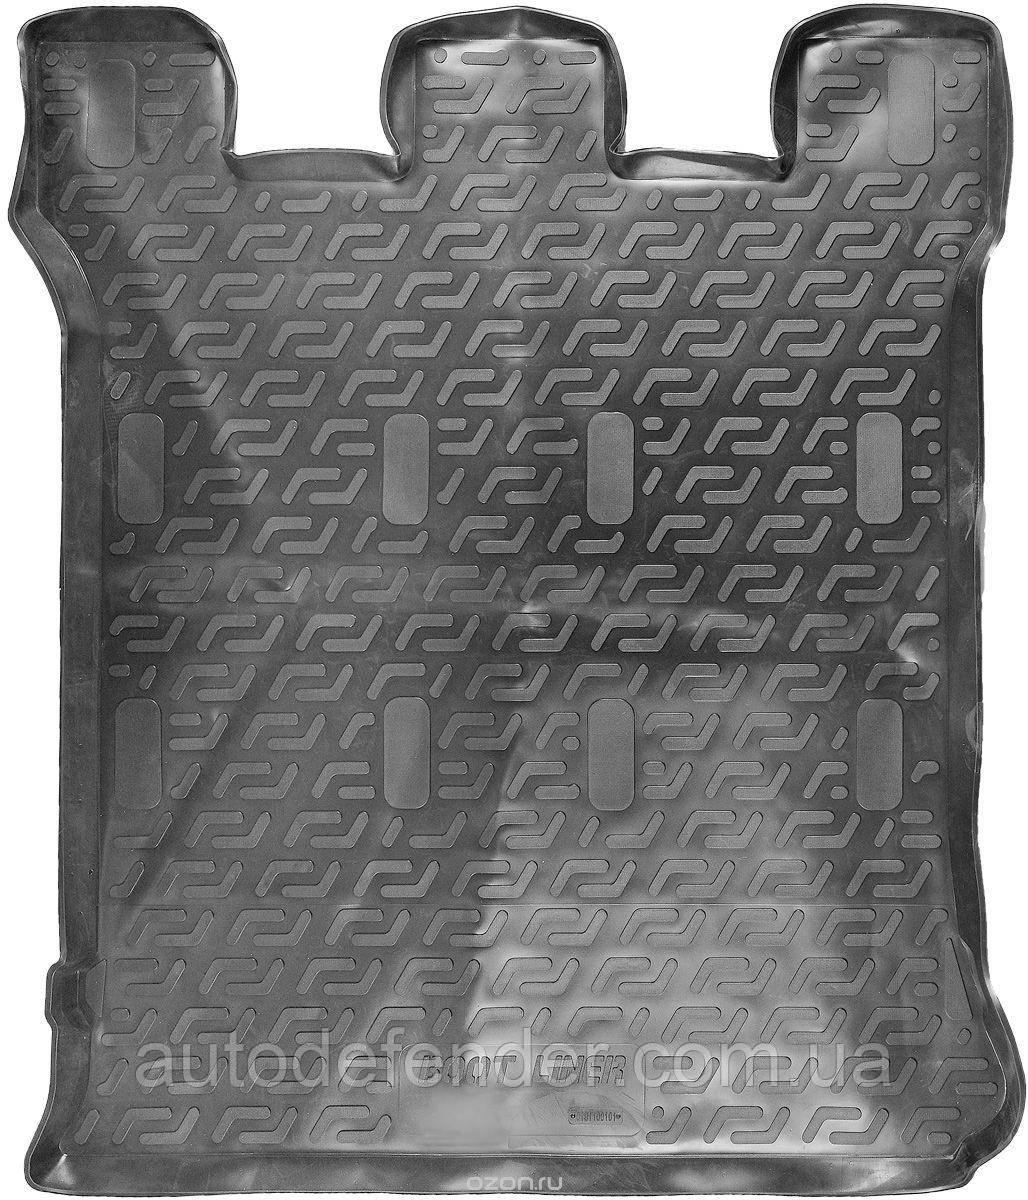 Килимок в багажник для Volkswagen Sharan 2001-10, резино/пластиковий (Lada Locker)